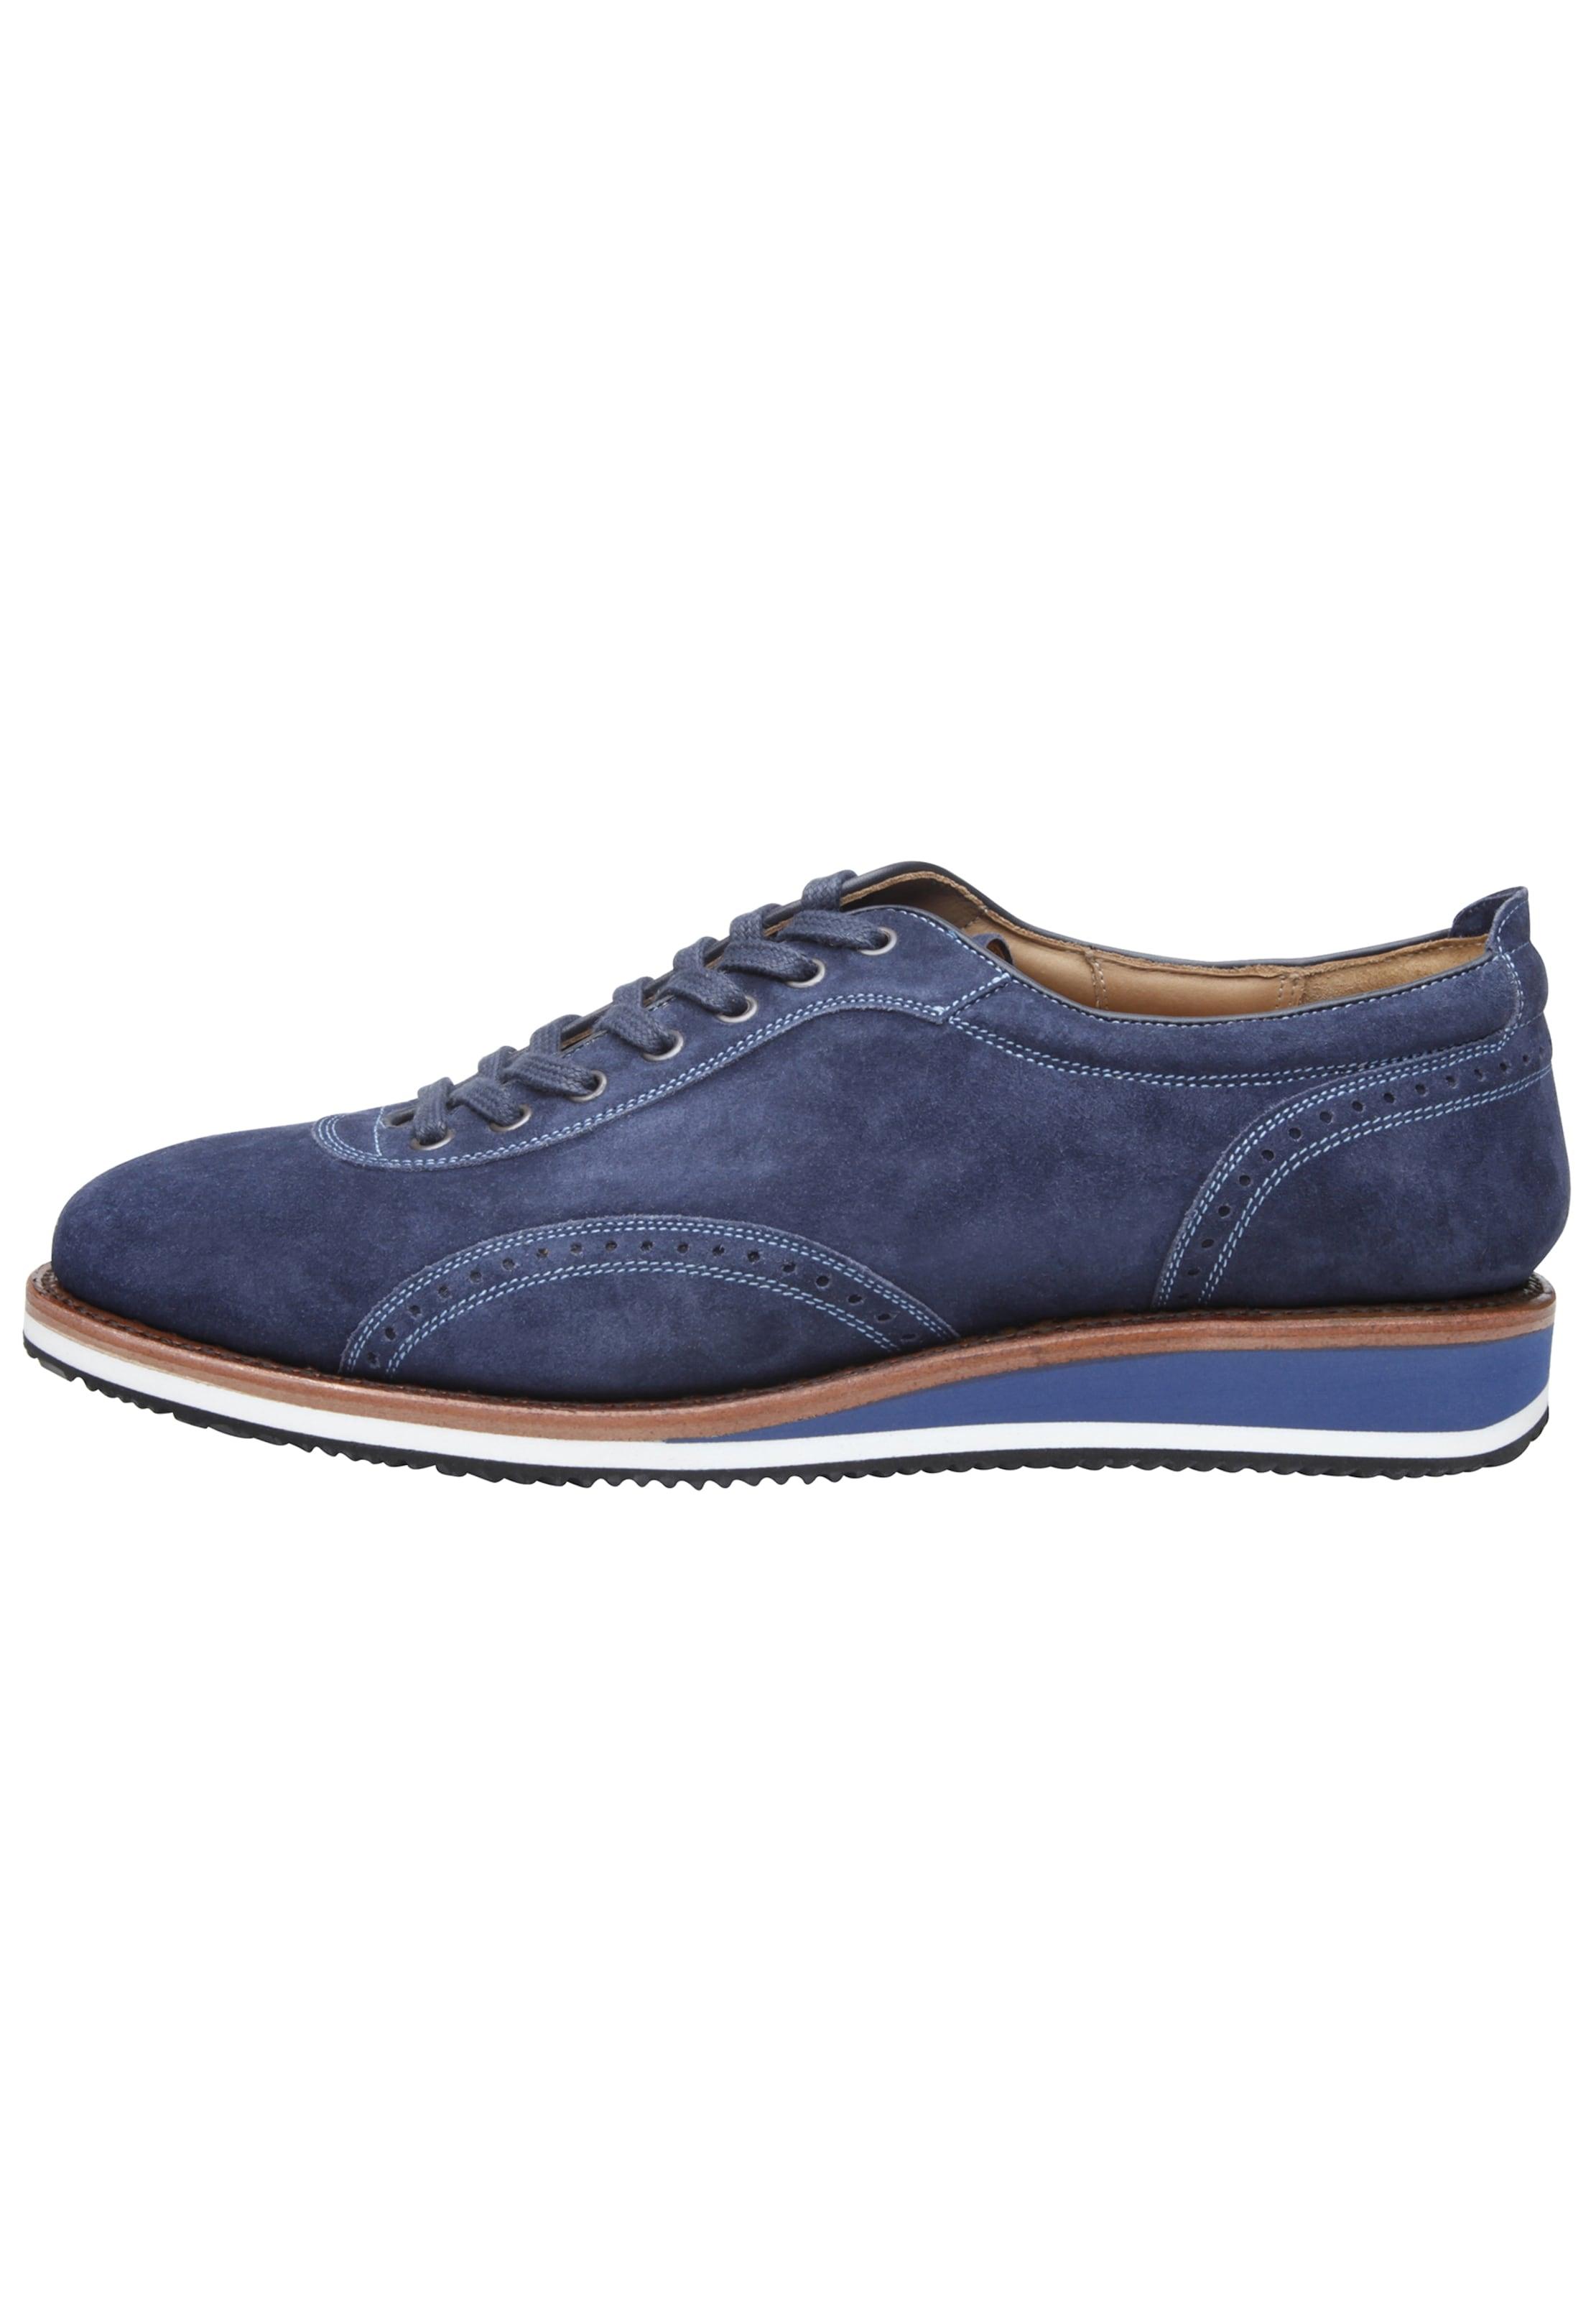 Halbschuhe Blau Shoepassion In 'no967' In Halbschuhe 'no967' Shoepassion 0yONPvm8nw